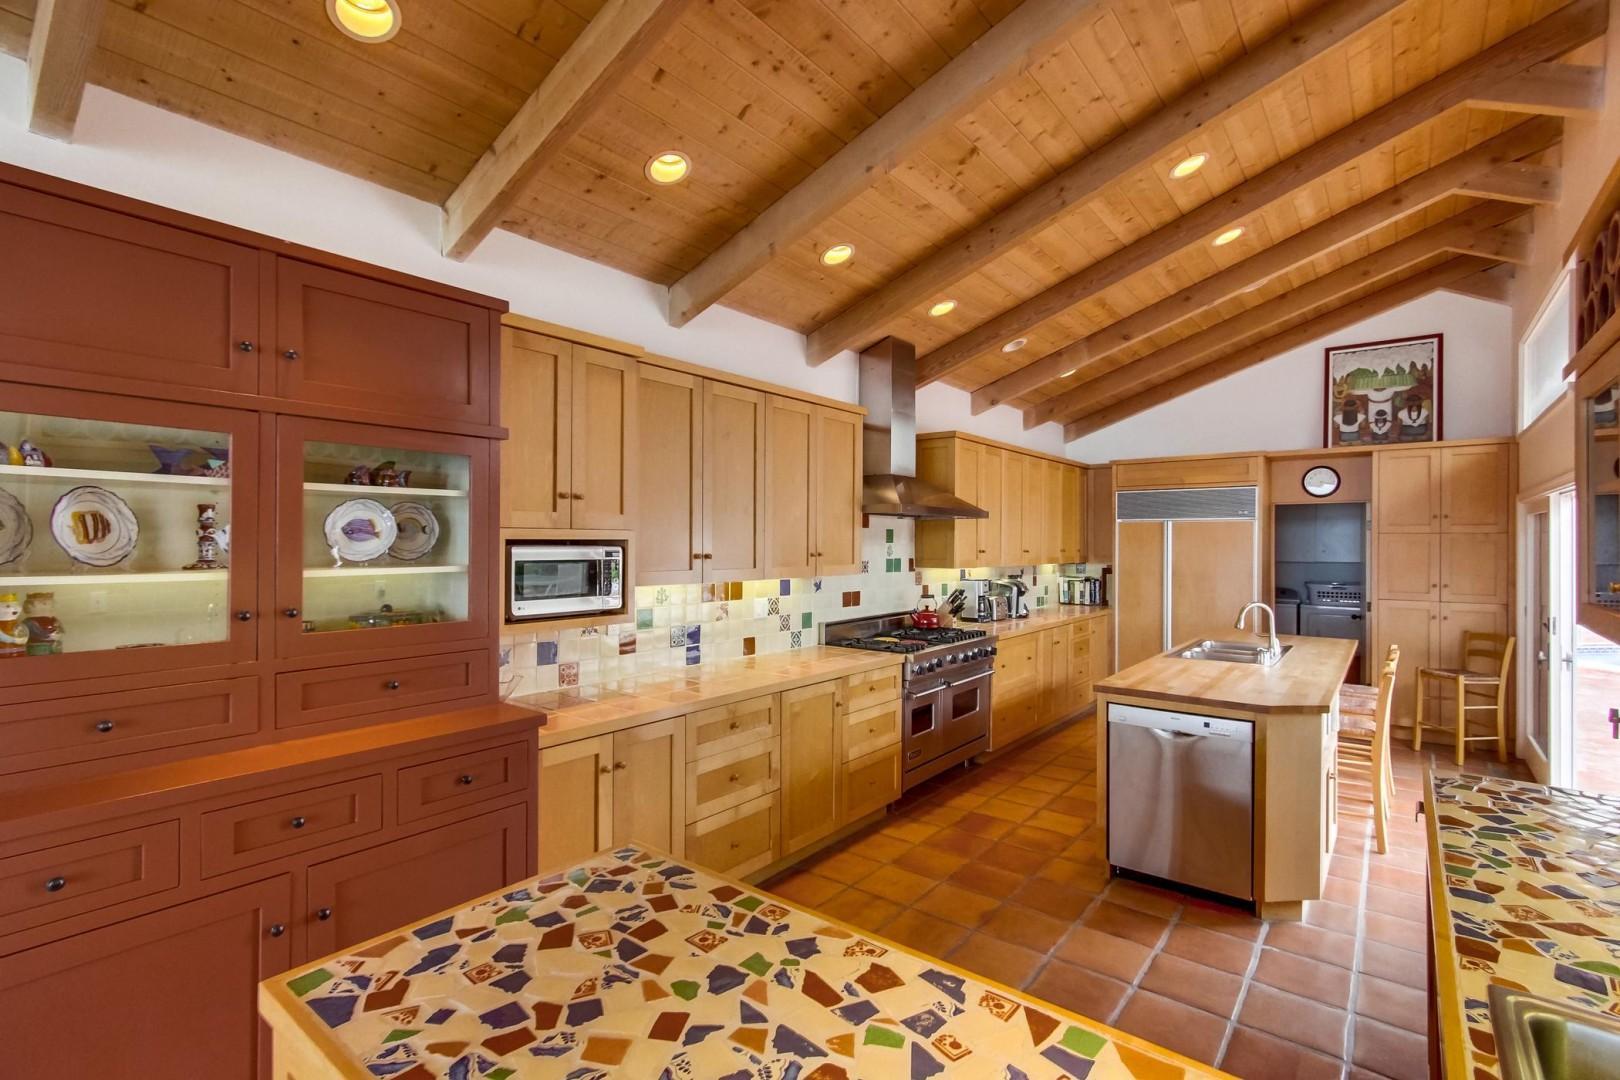 Beautiful open kitchen with island